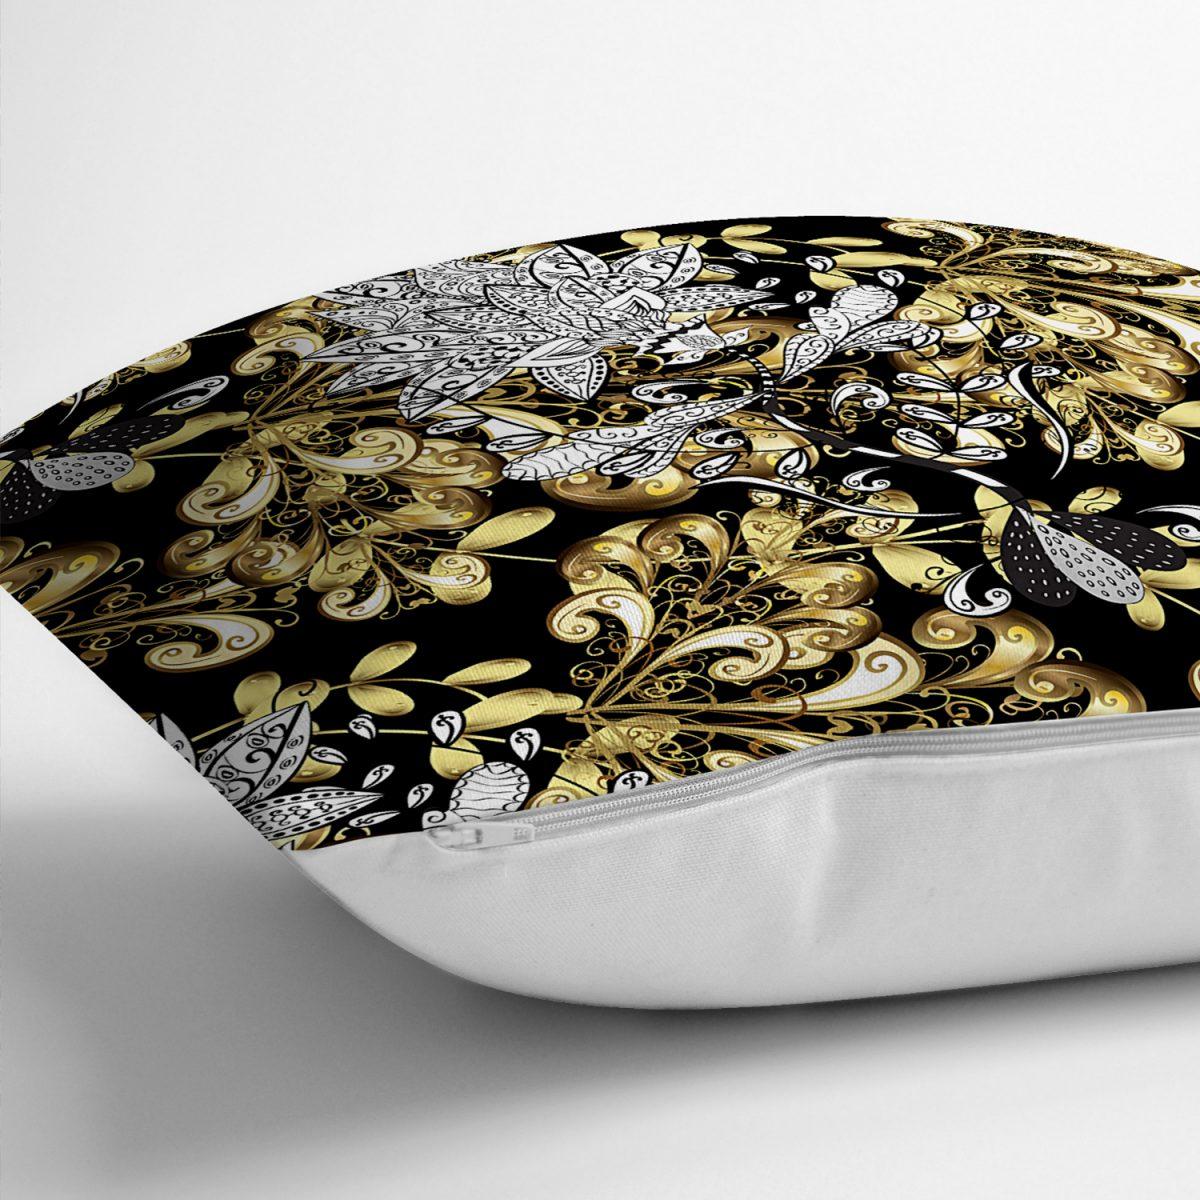 Realhomes Özel Tasarım Dijtal Baskılı Modern Yastık Kırlent Kılıfı Realhomes